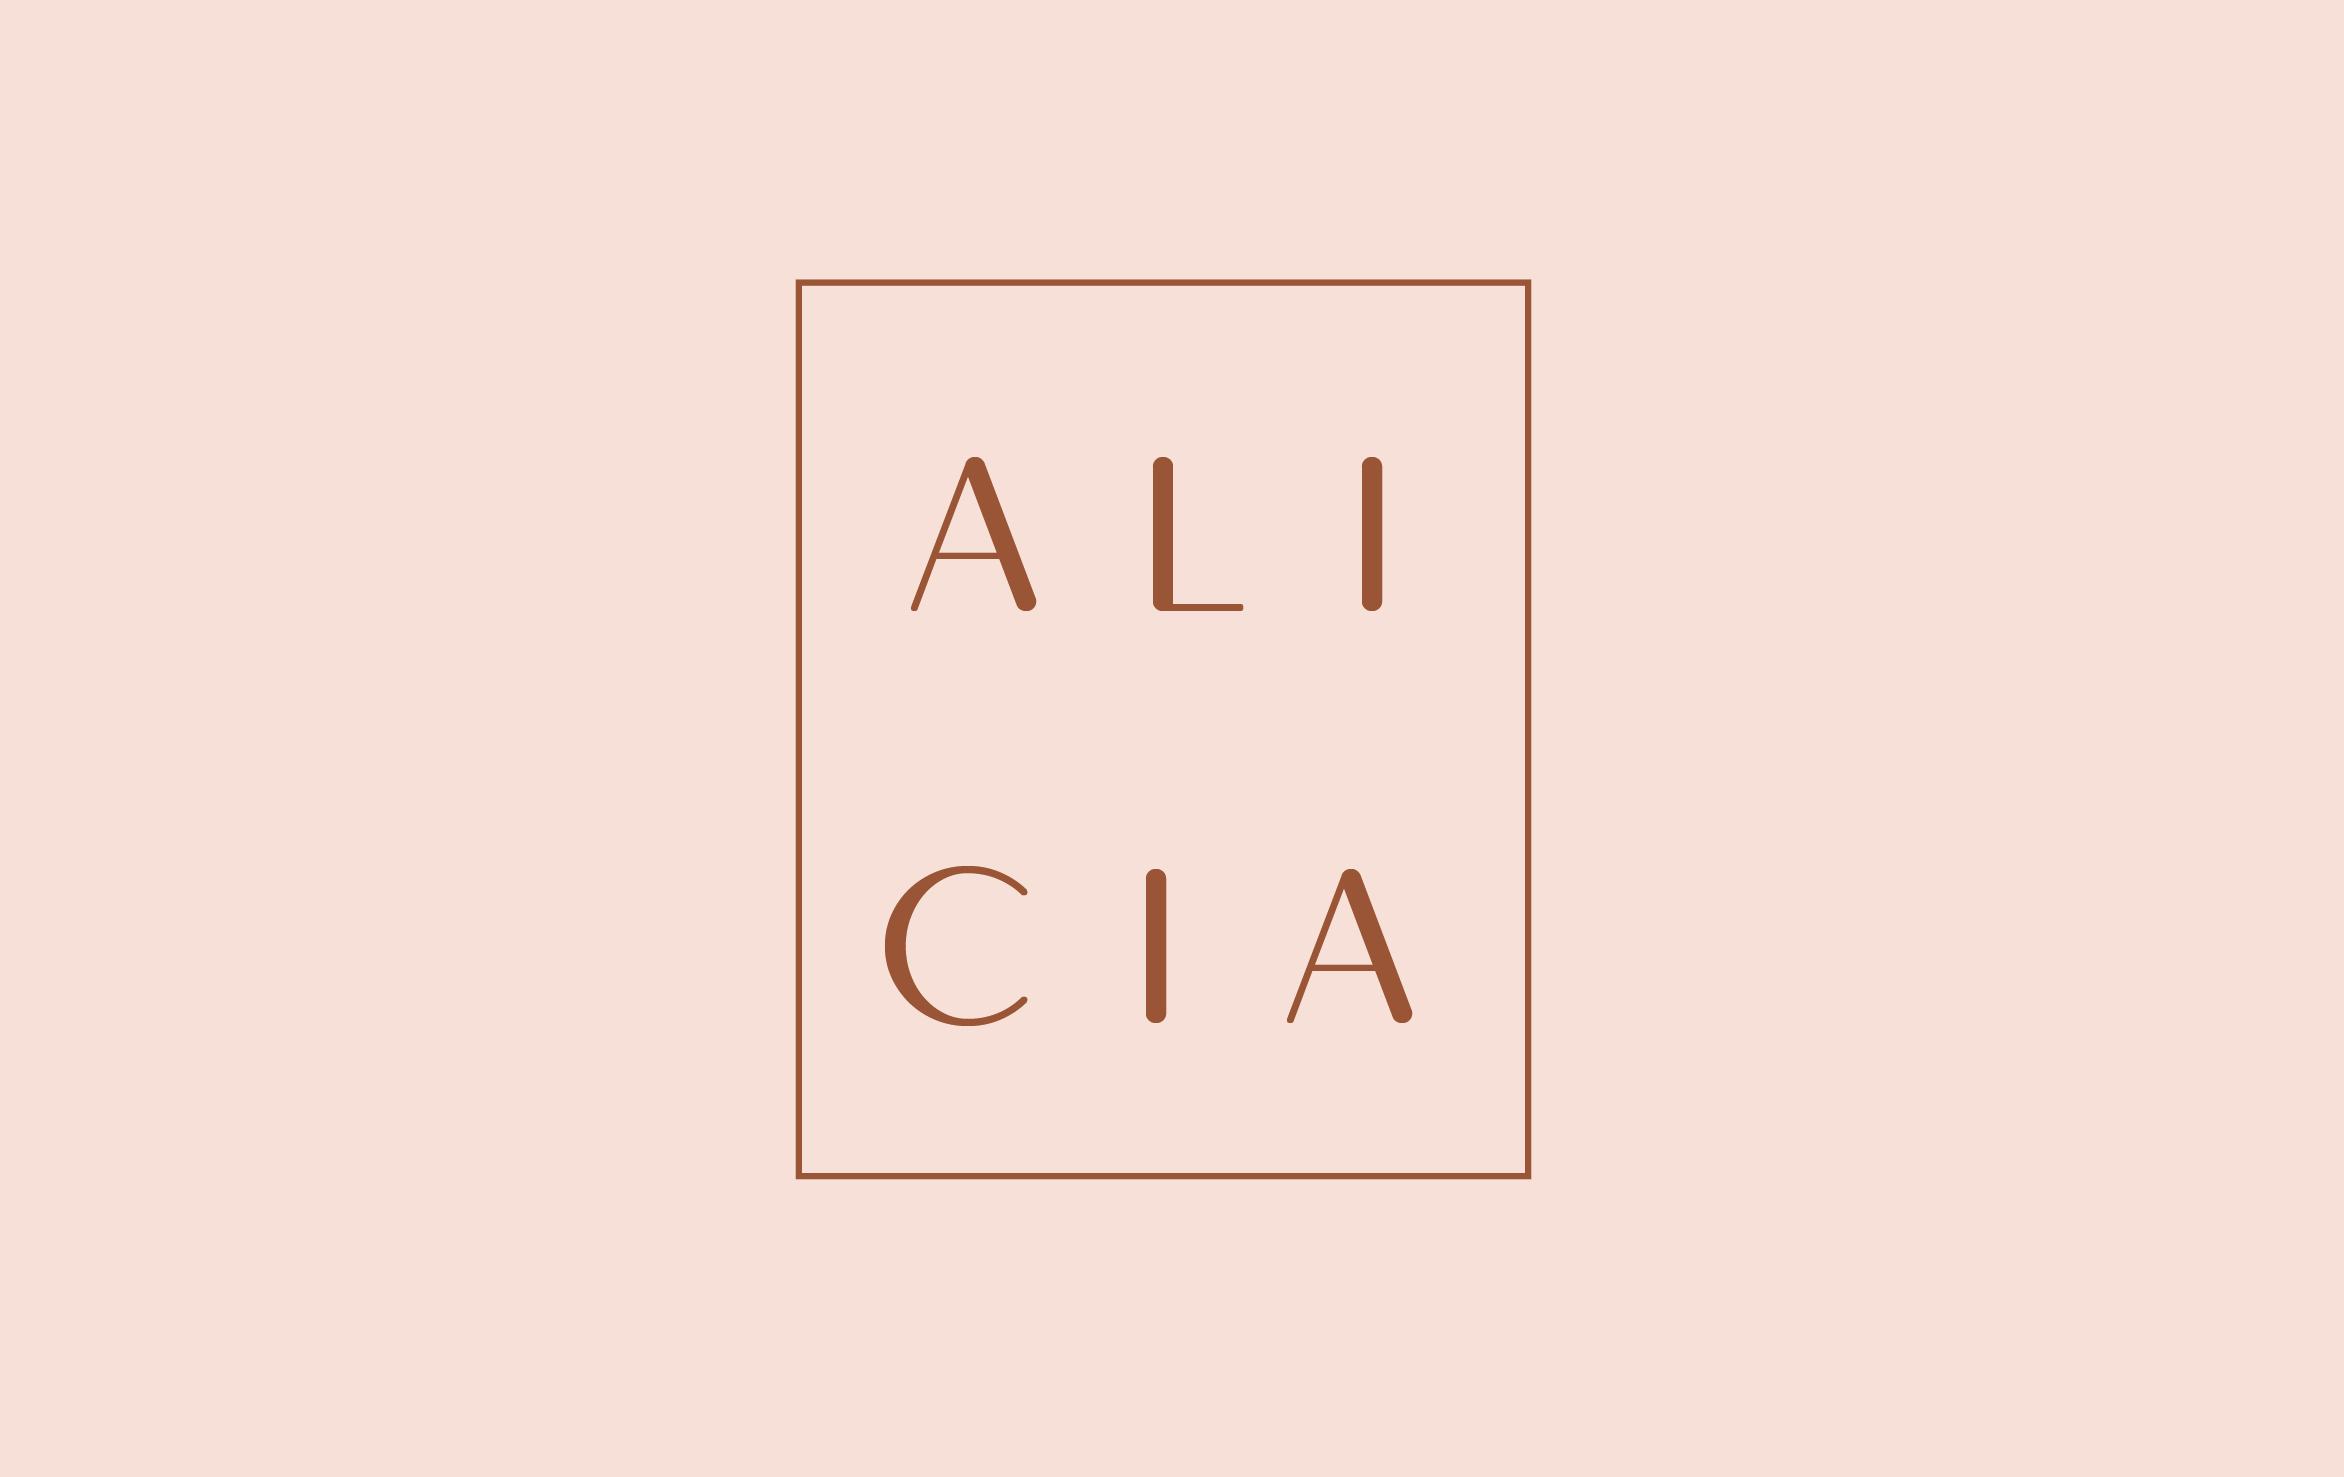 Alicia_Galerie.victorinepiot.com.png